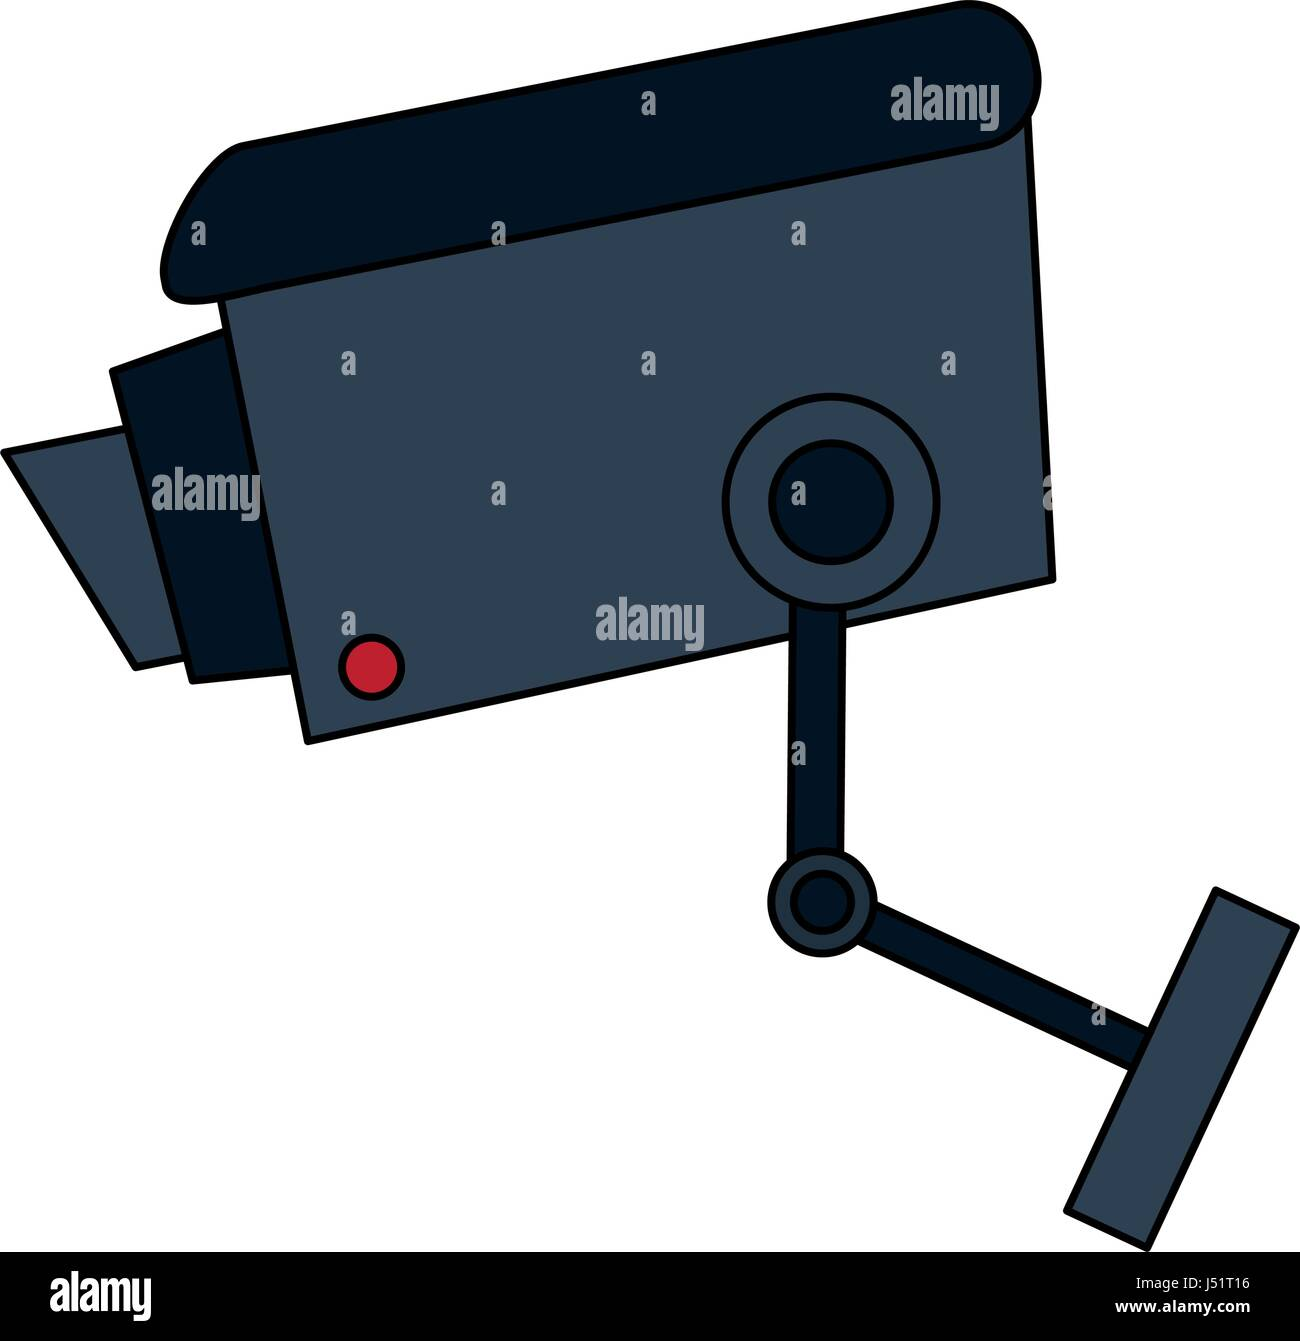 color image infrared surveillance camera icon - Stock Image